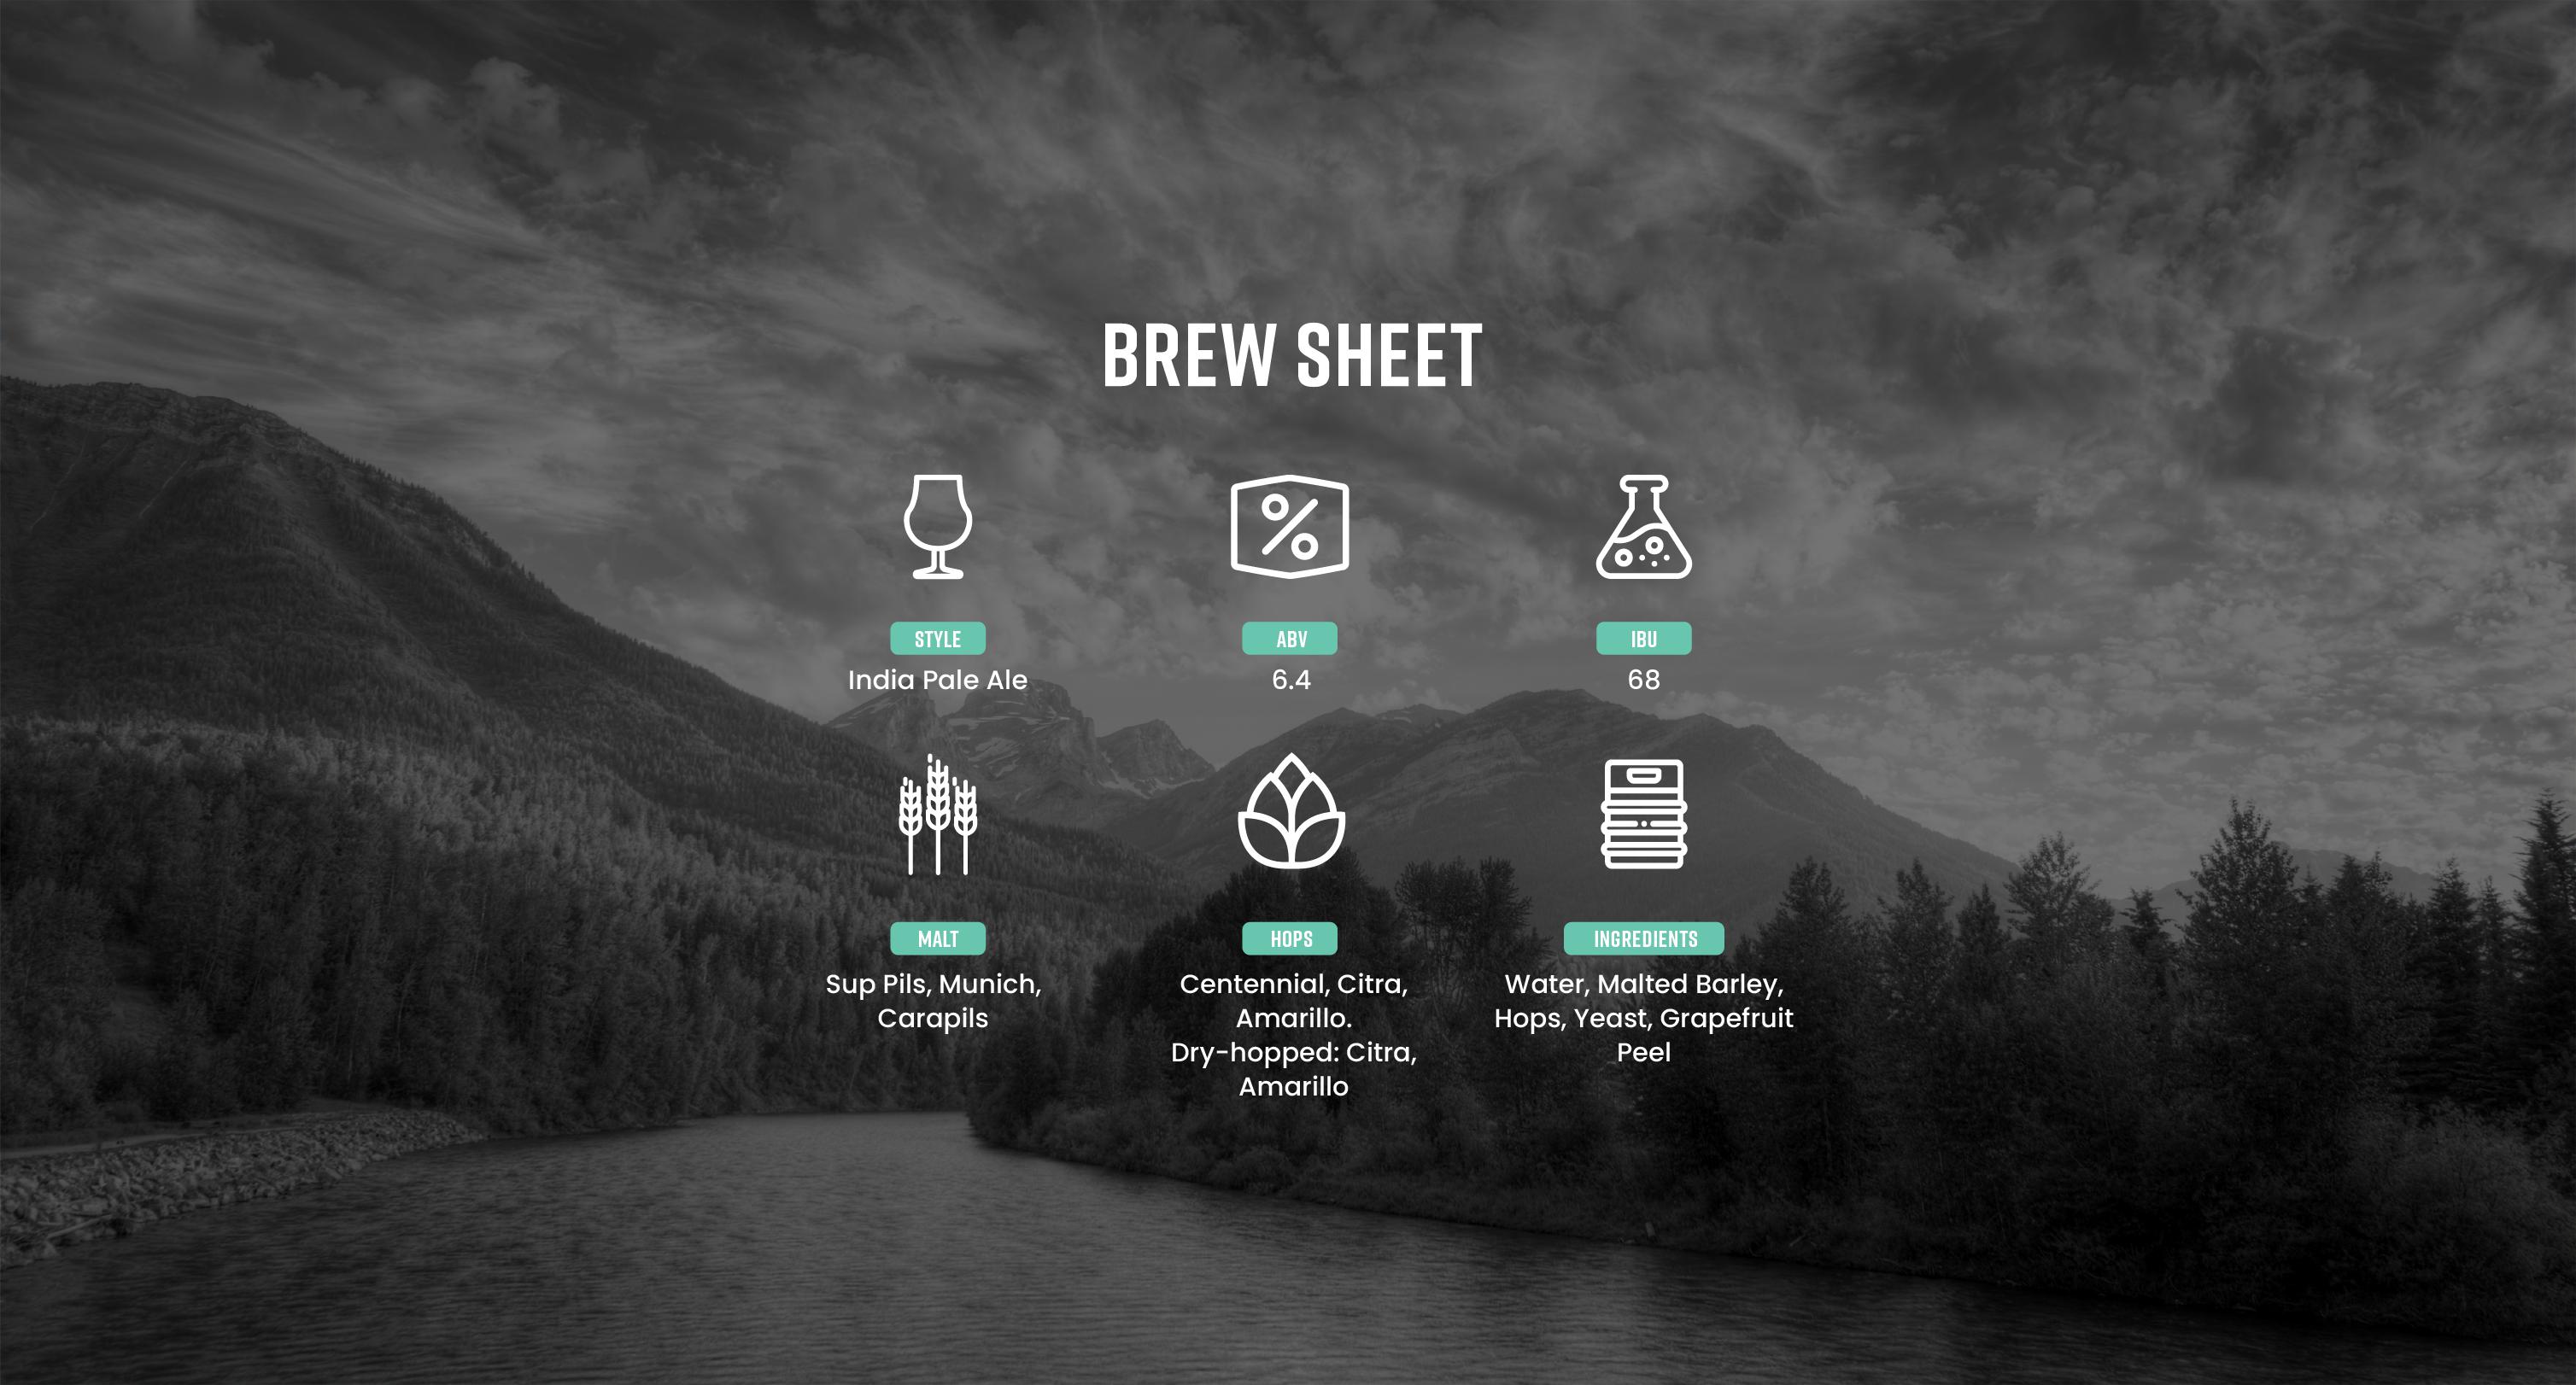 Real Peel IPA Brew Sheet